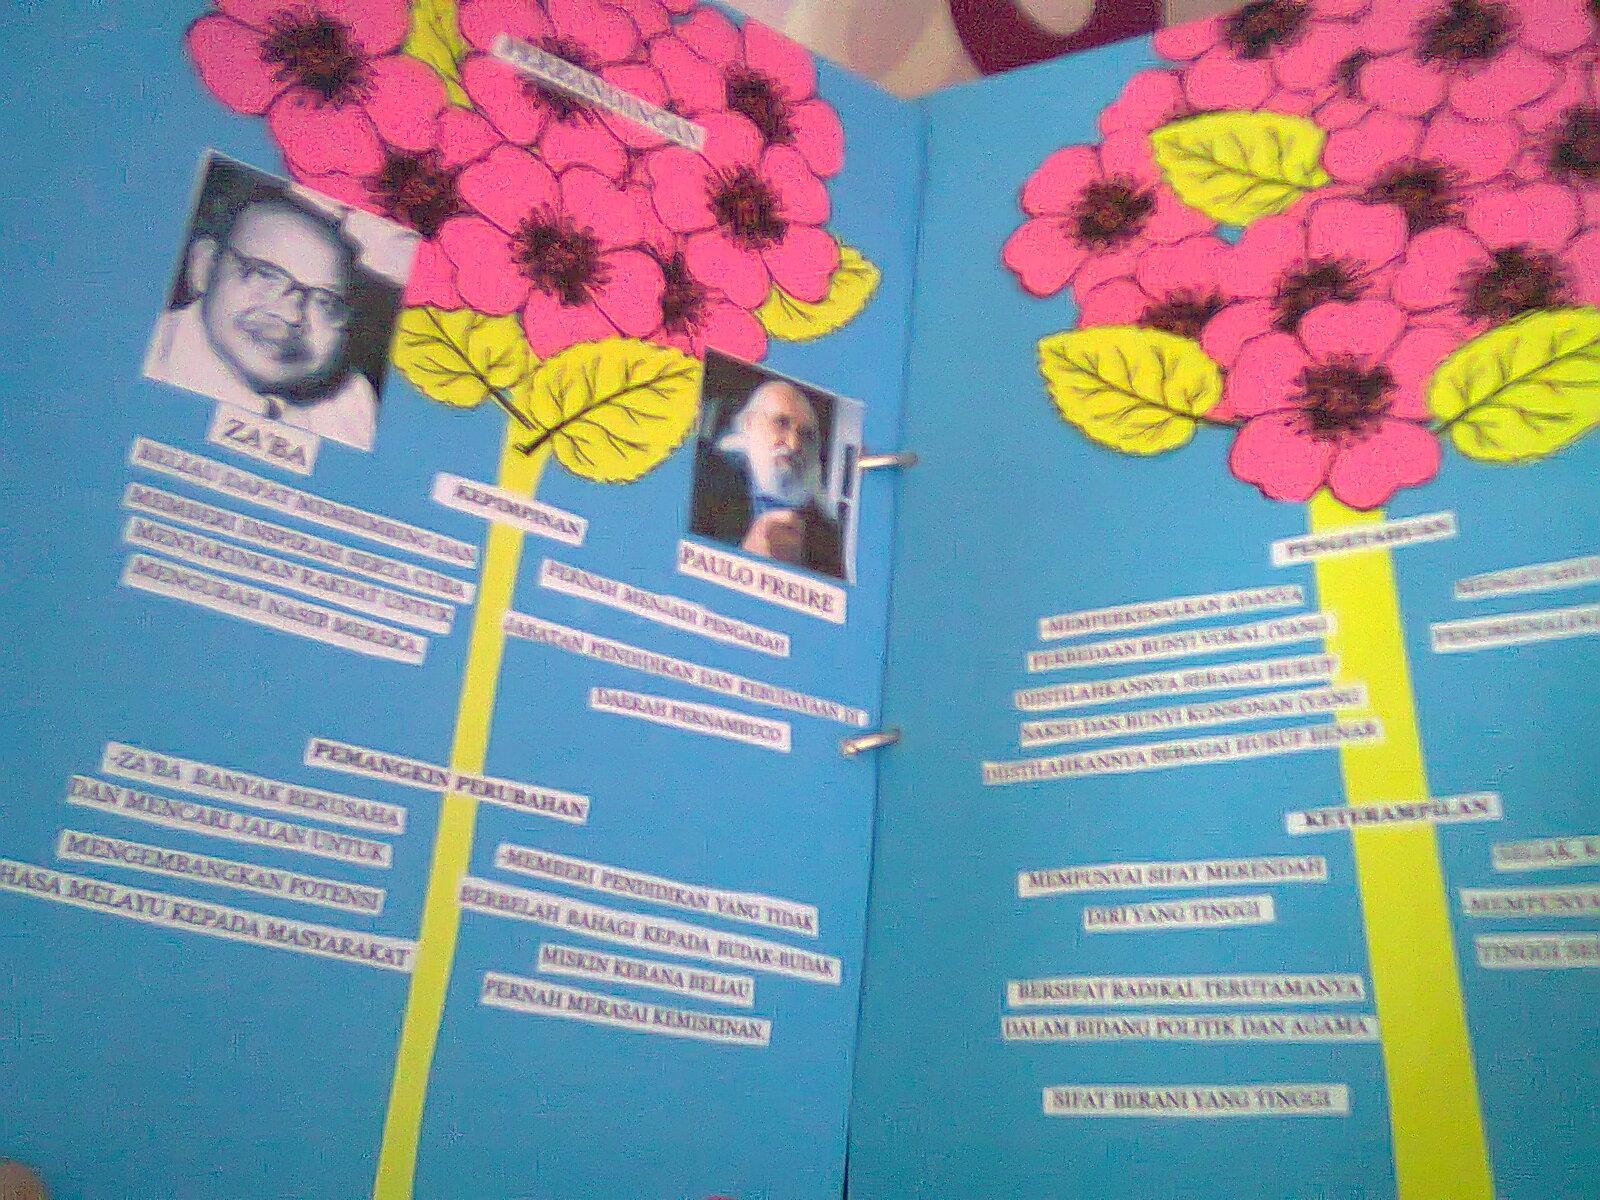 Download gratis lagu bunga dahlia